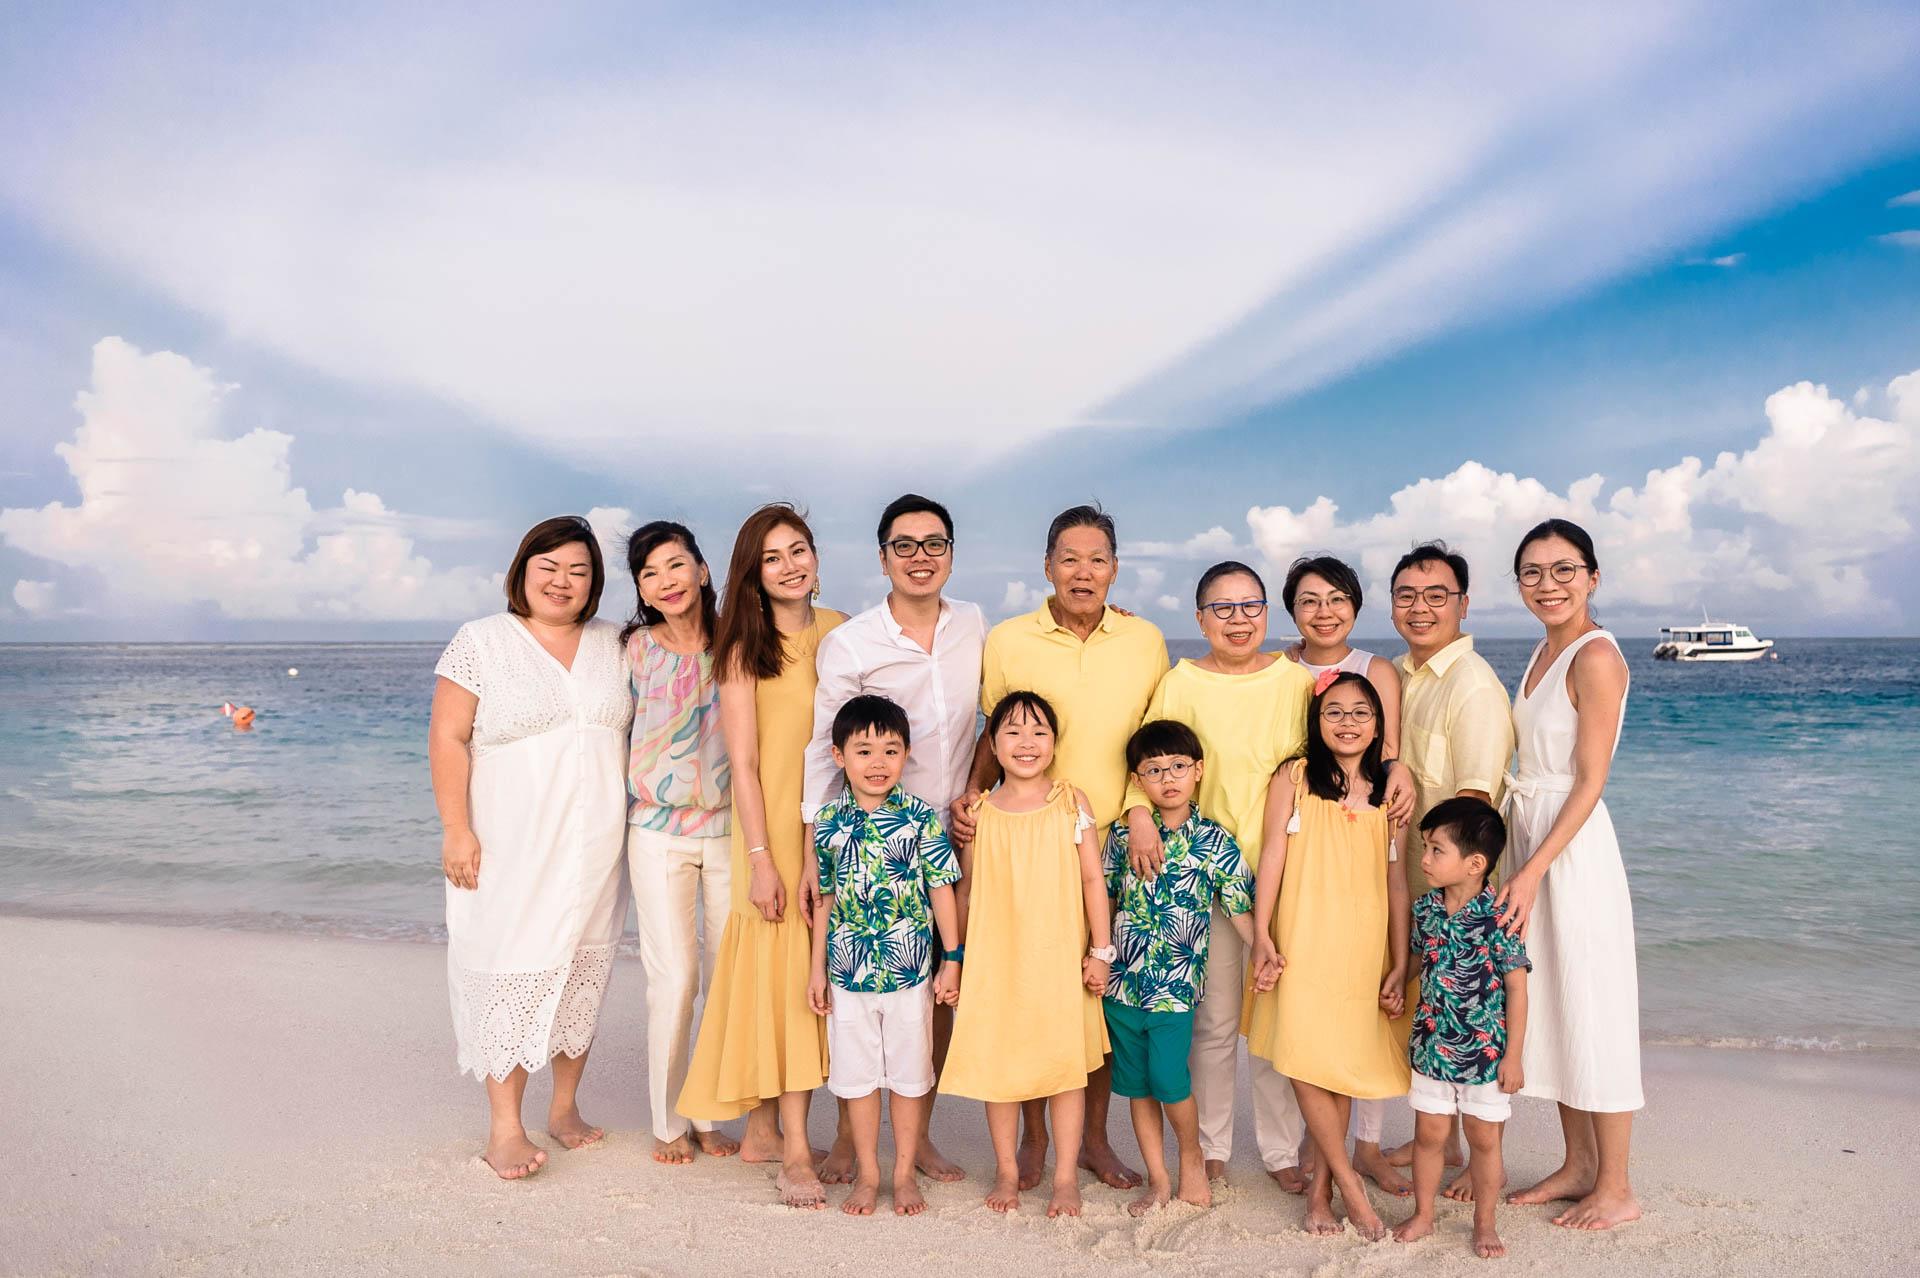 Jos Extended Family at Constance Moofushi Maldives 3